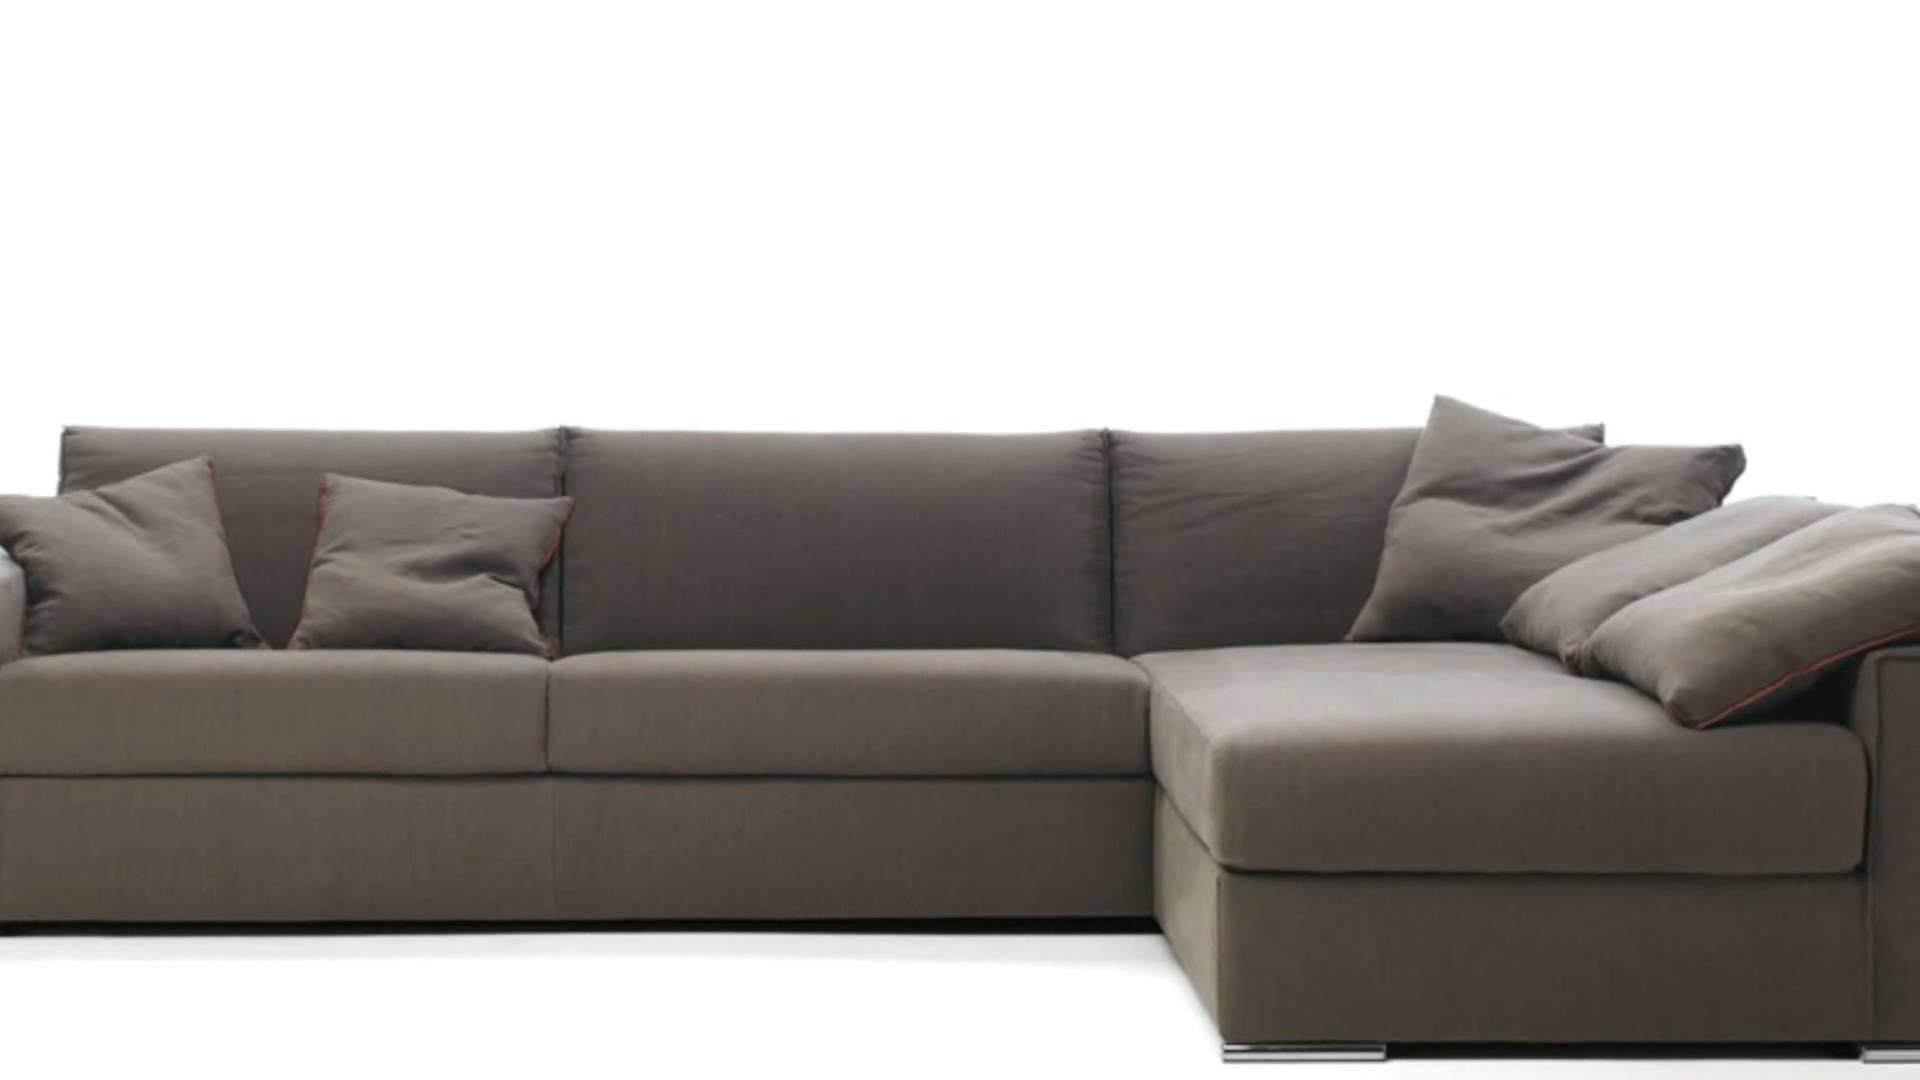 Sofas Center : Impressive Modern Sofa Beds Photo Design Santafe With Regard To Long Modern Sofas (Image 18 of 20)